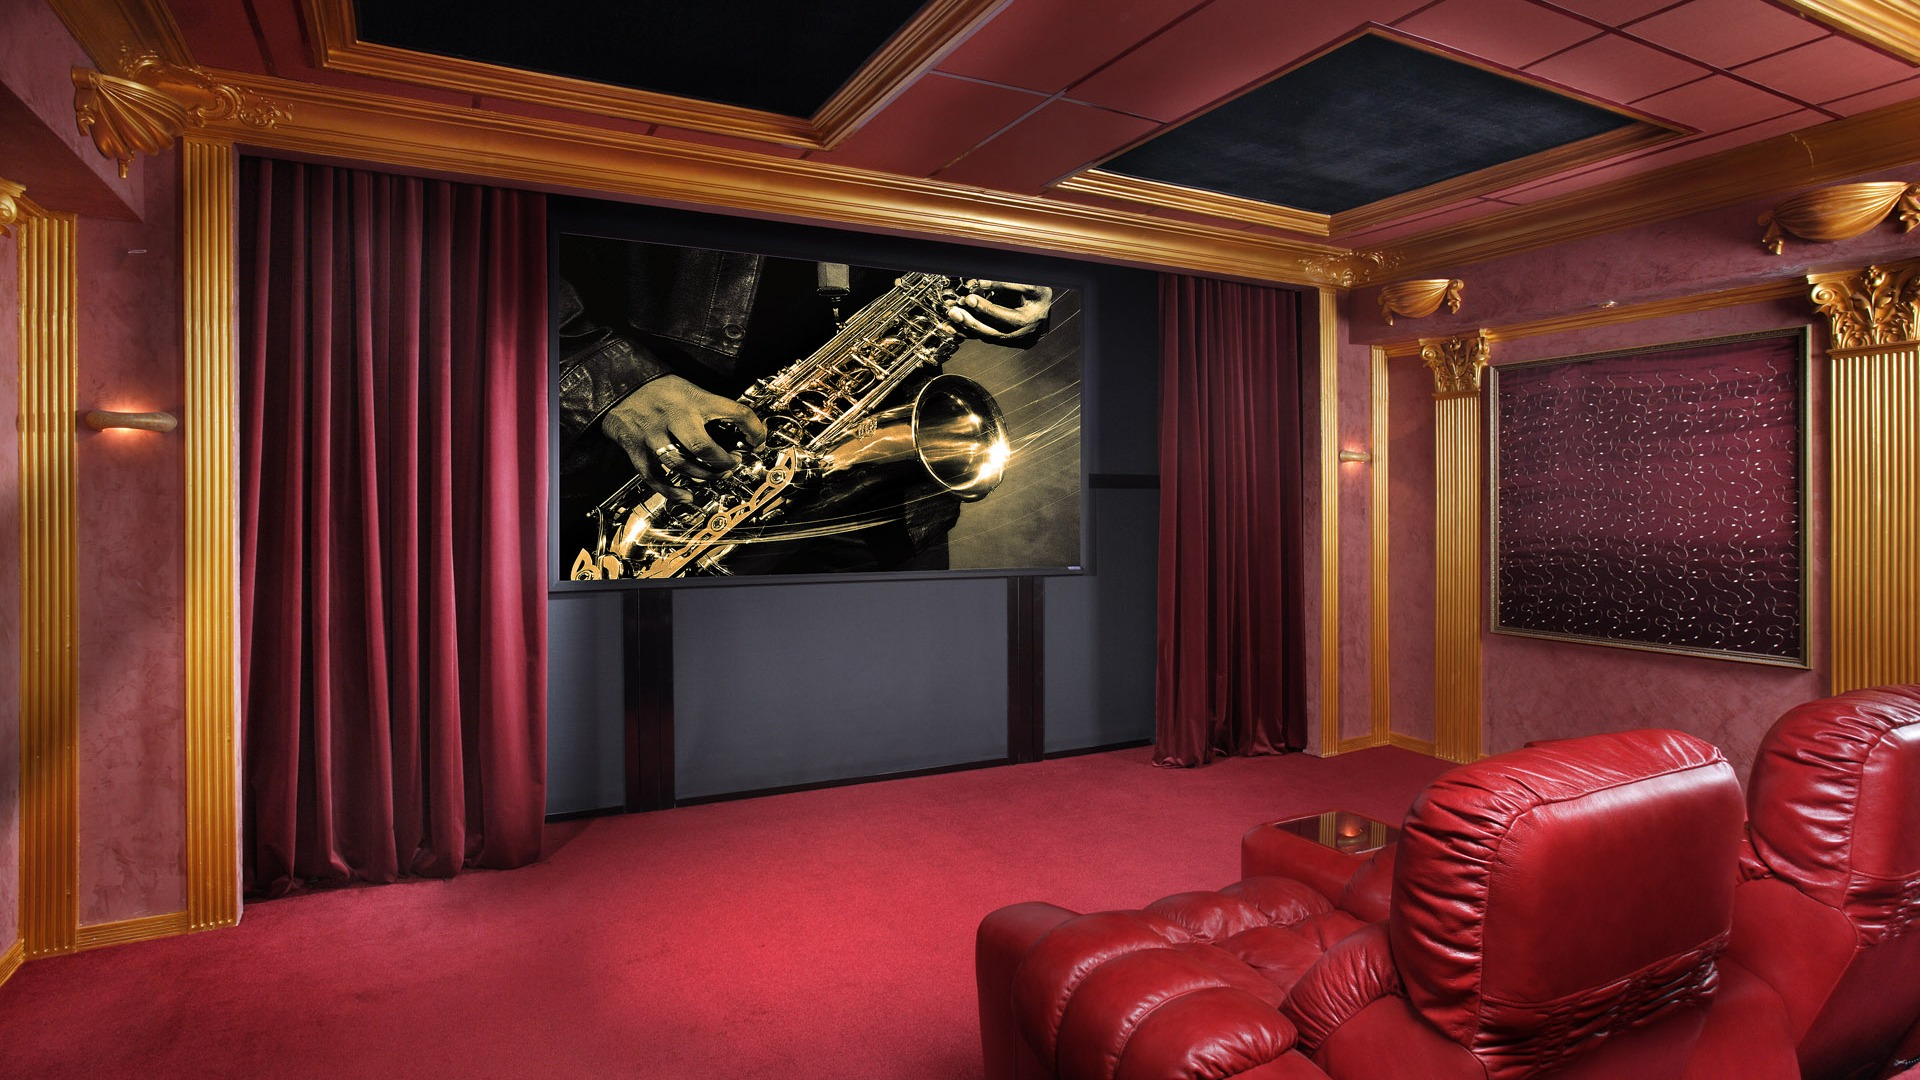 Fondo de pantalla de cine en casa (2) #18 - 1920x1080 Fondos de ...